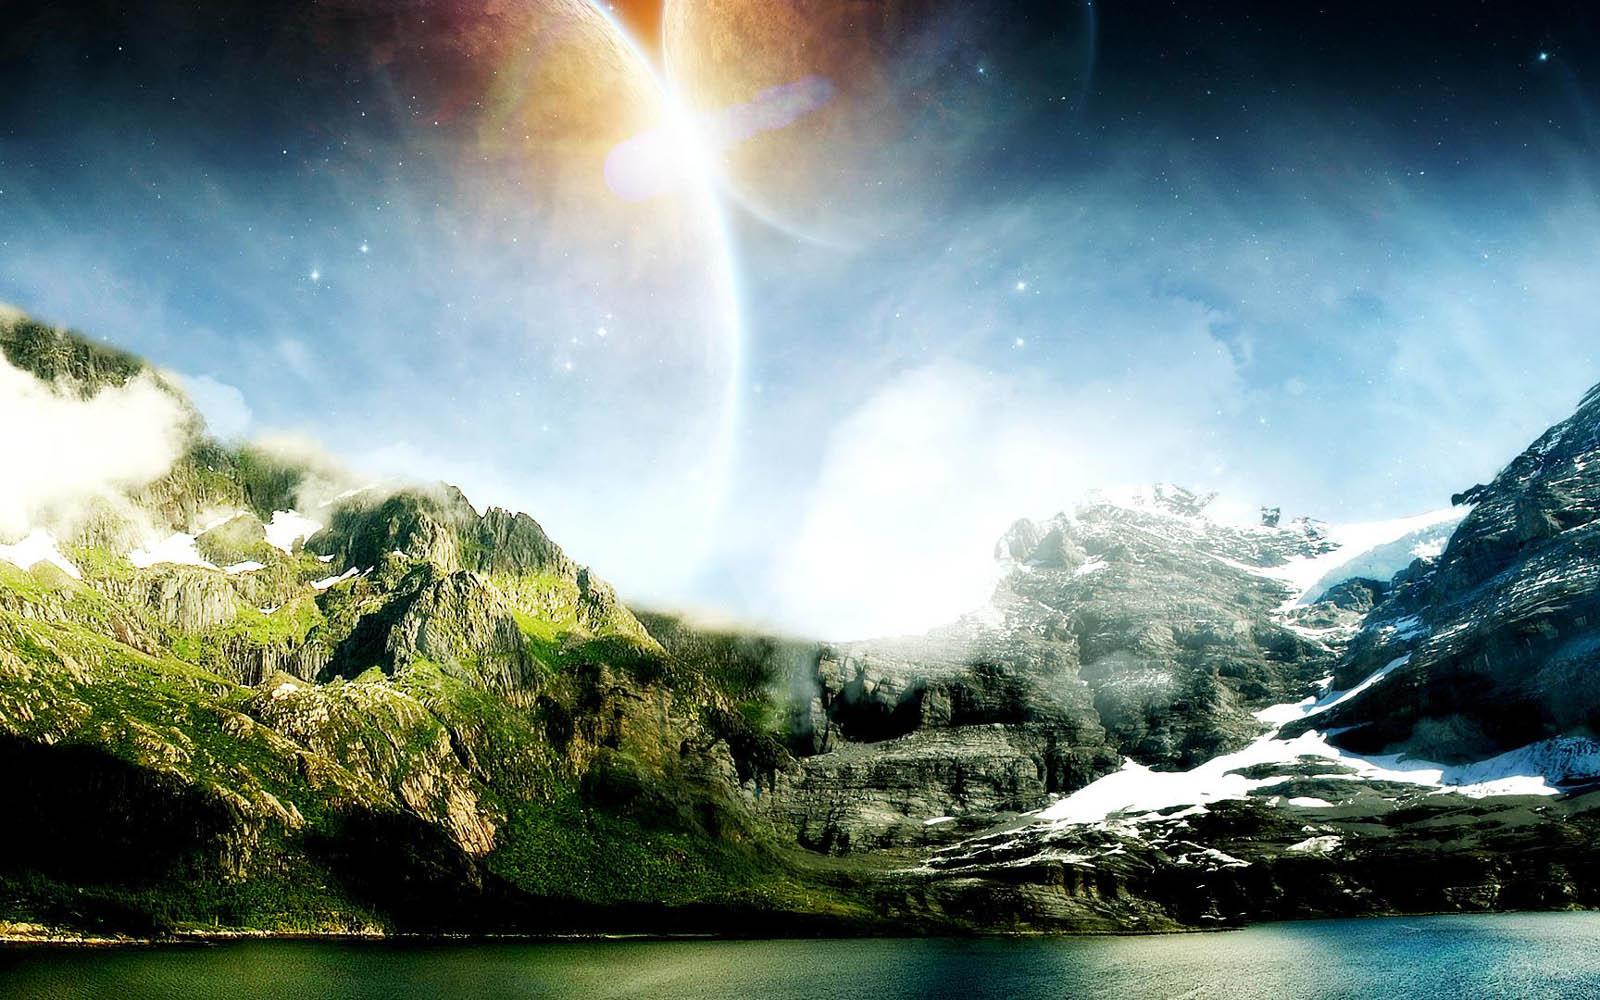 Xs wallpapers hd fantasy art scenery wallpapers - Fantasy desktop pictures ...